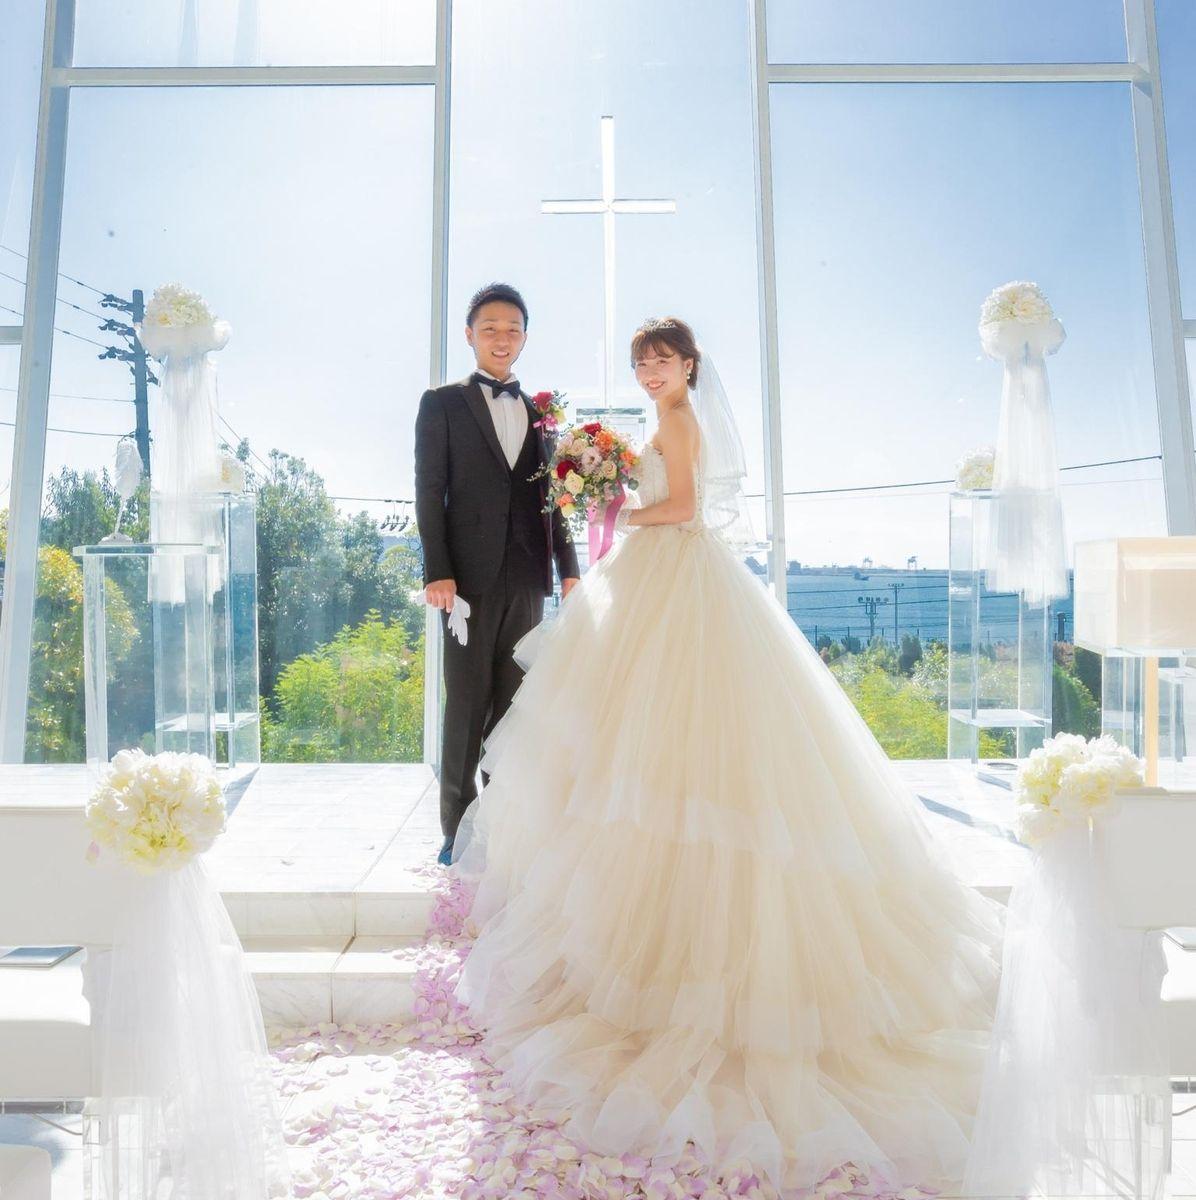 yc_wedding2018さんのベイサイド迎賓館 松山写真1枚目